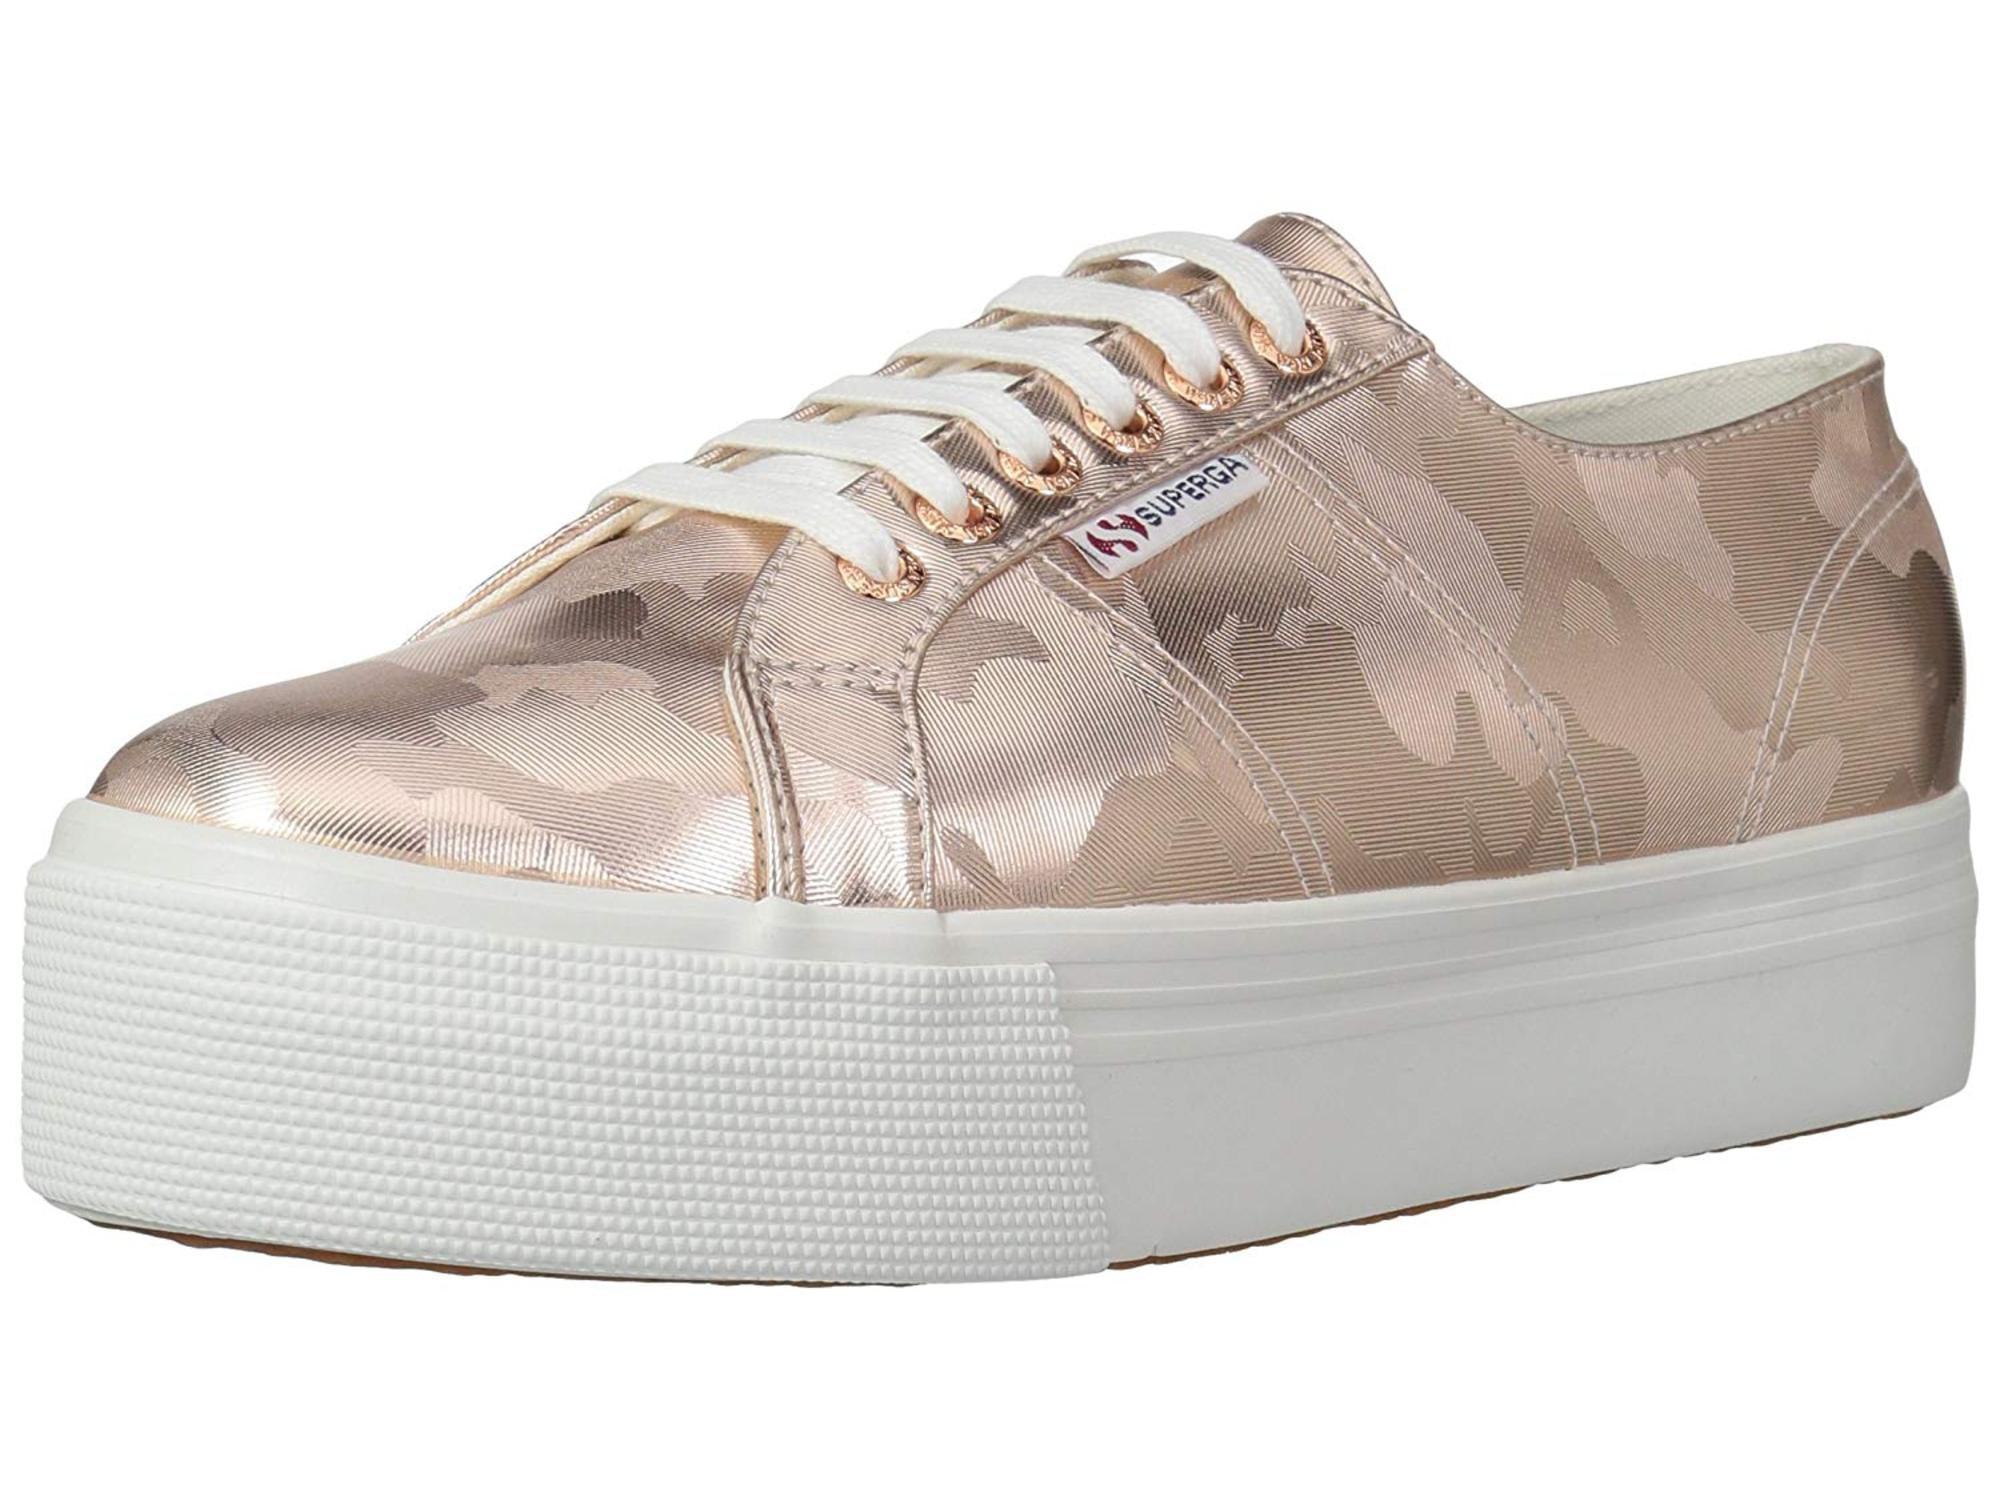 Superga Damenschuhe Sneakers, Army Fabric Niedrig Top Lace Up Fashion Sneakers, Damenschuhe , 6fa4e7